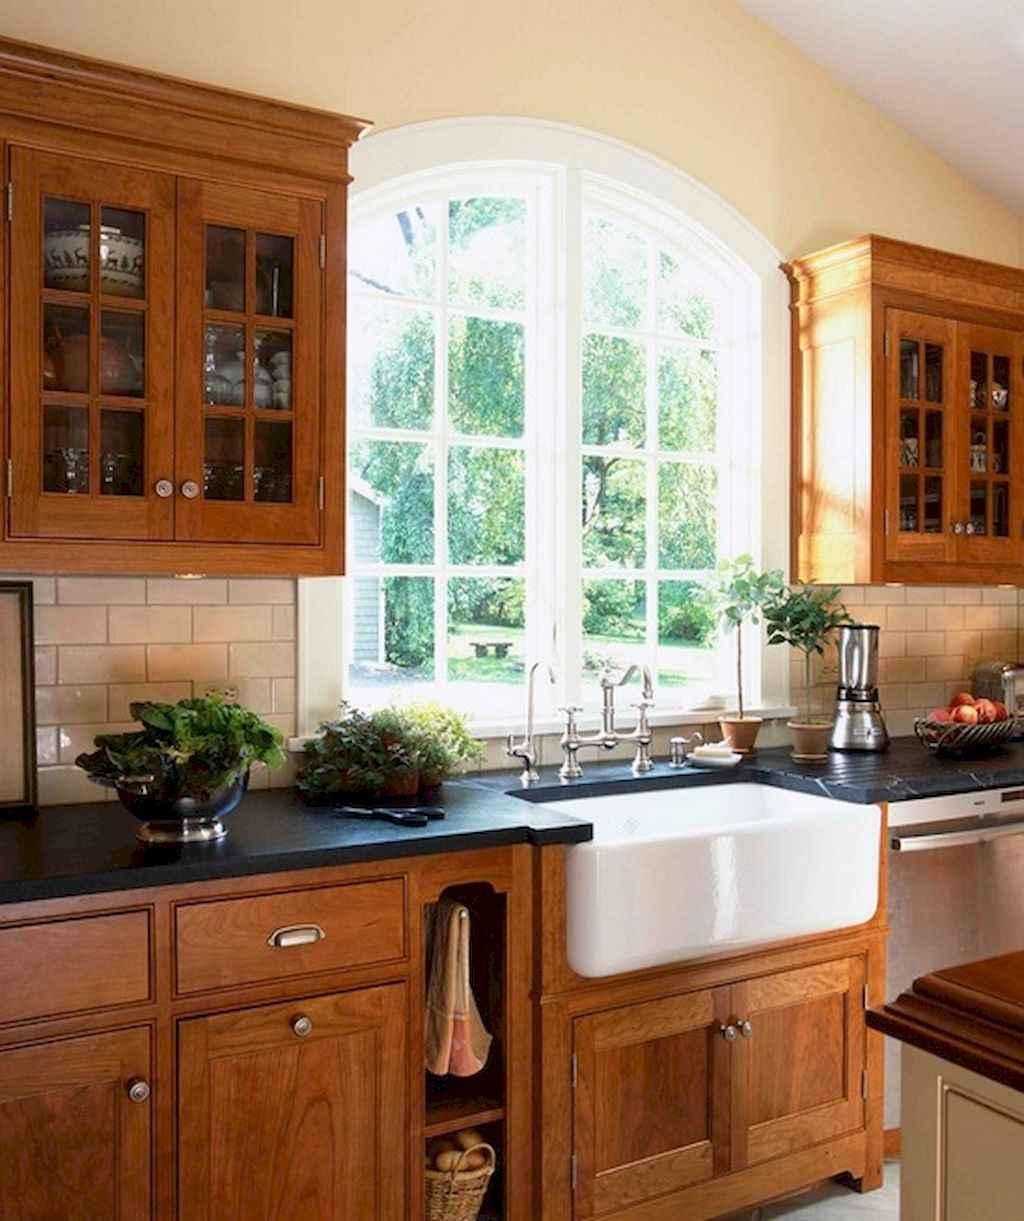 Kitchen Cabinet Ideas 2018: 100 Supreme Oak Kitchen Cabinets Ideas Decoration For